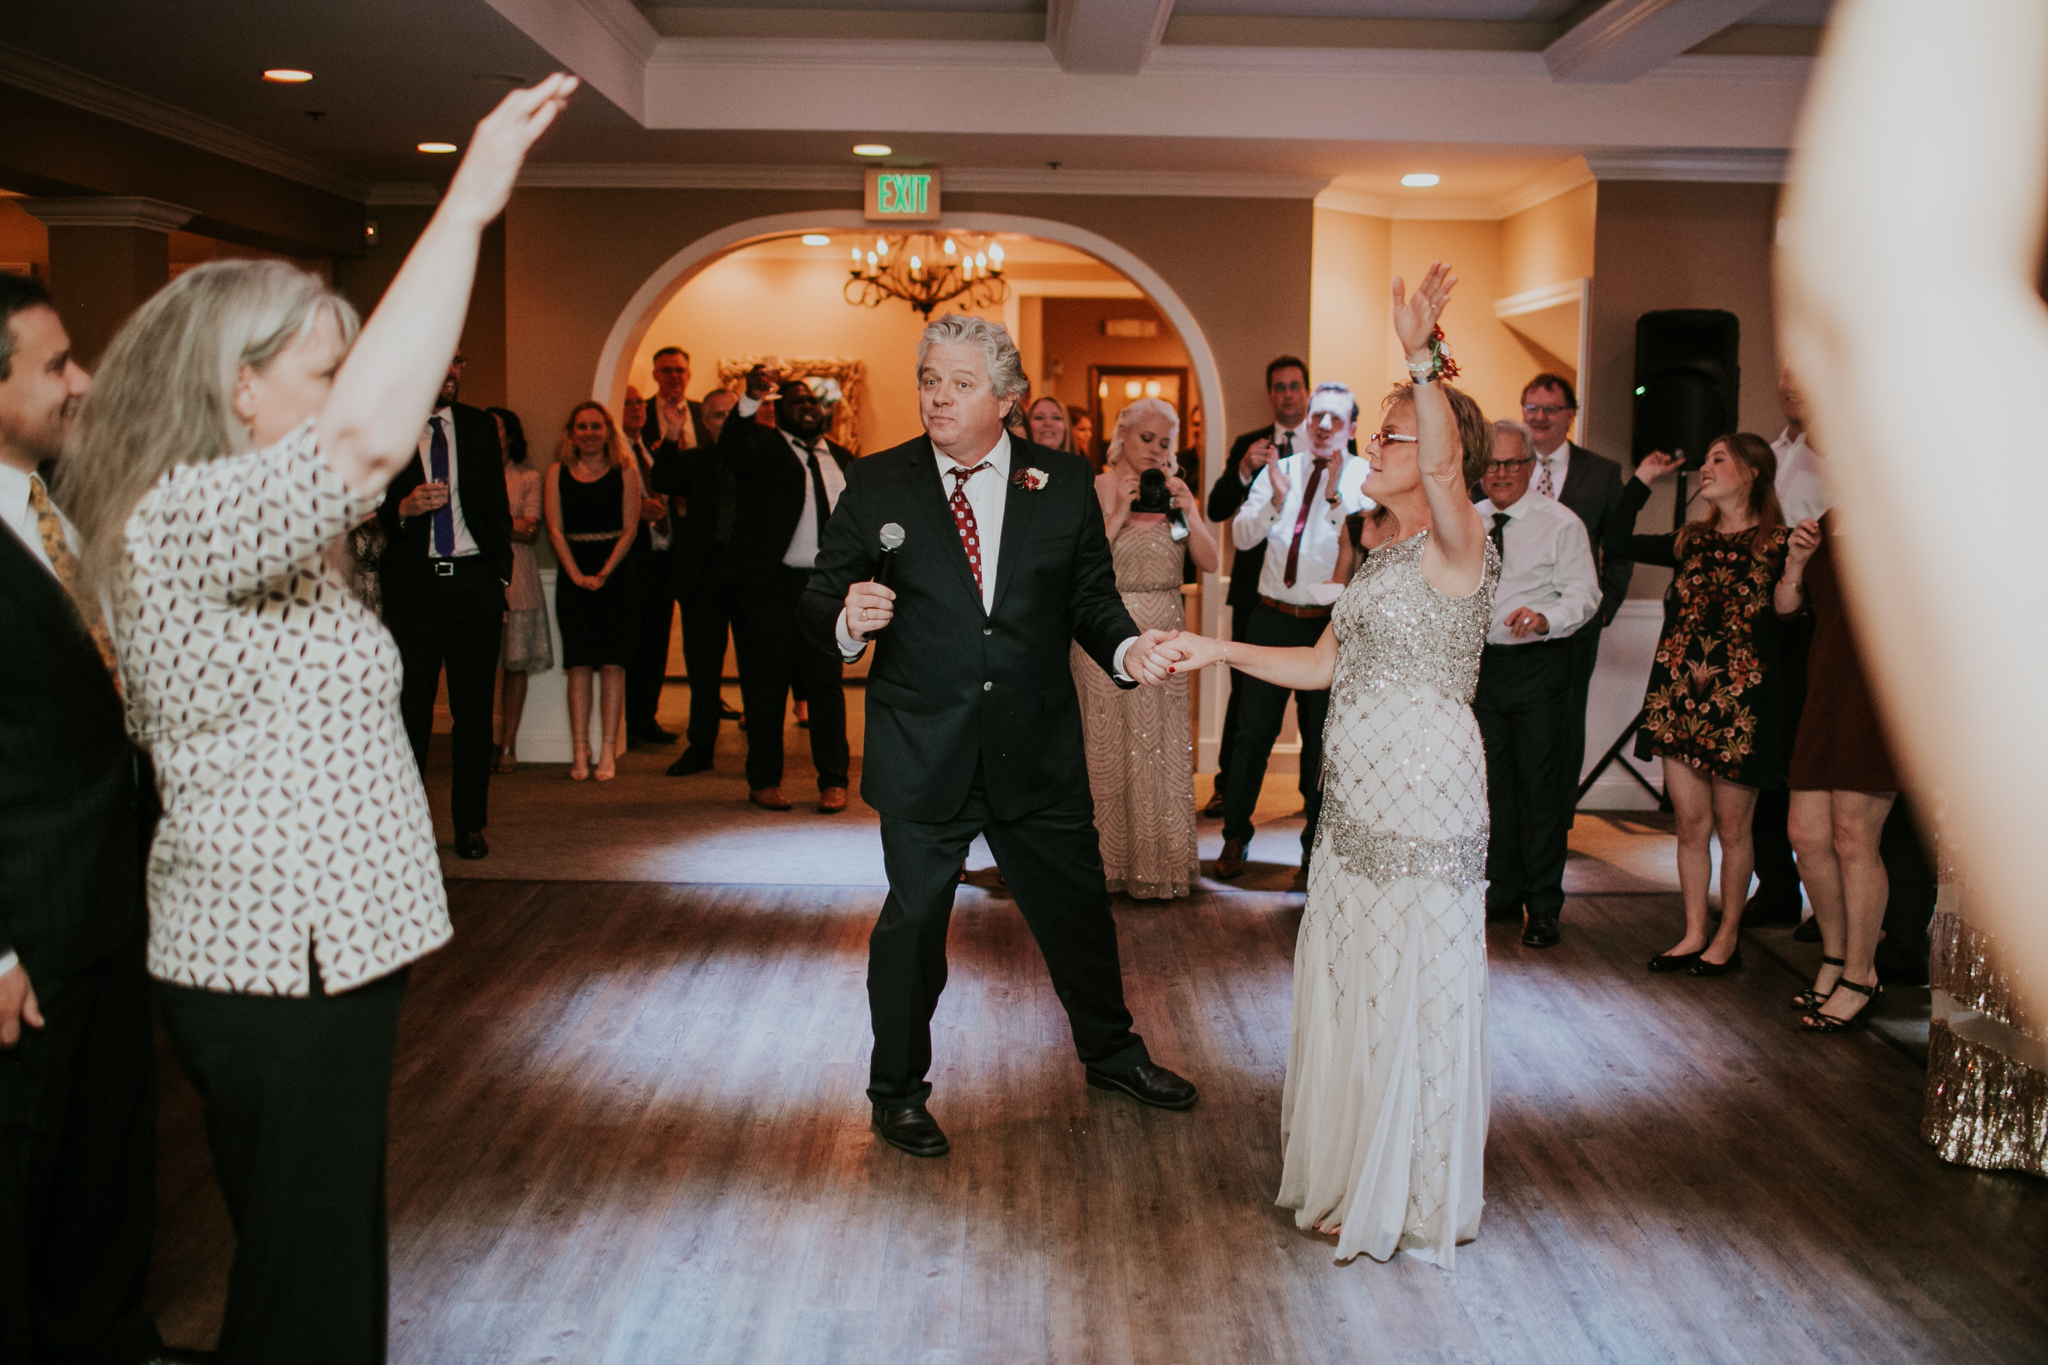 20151230_hussem_wedding_1057_web.jpg